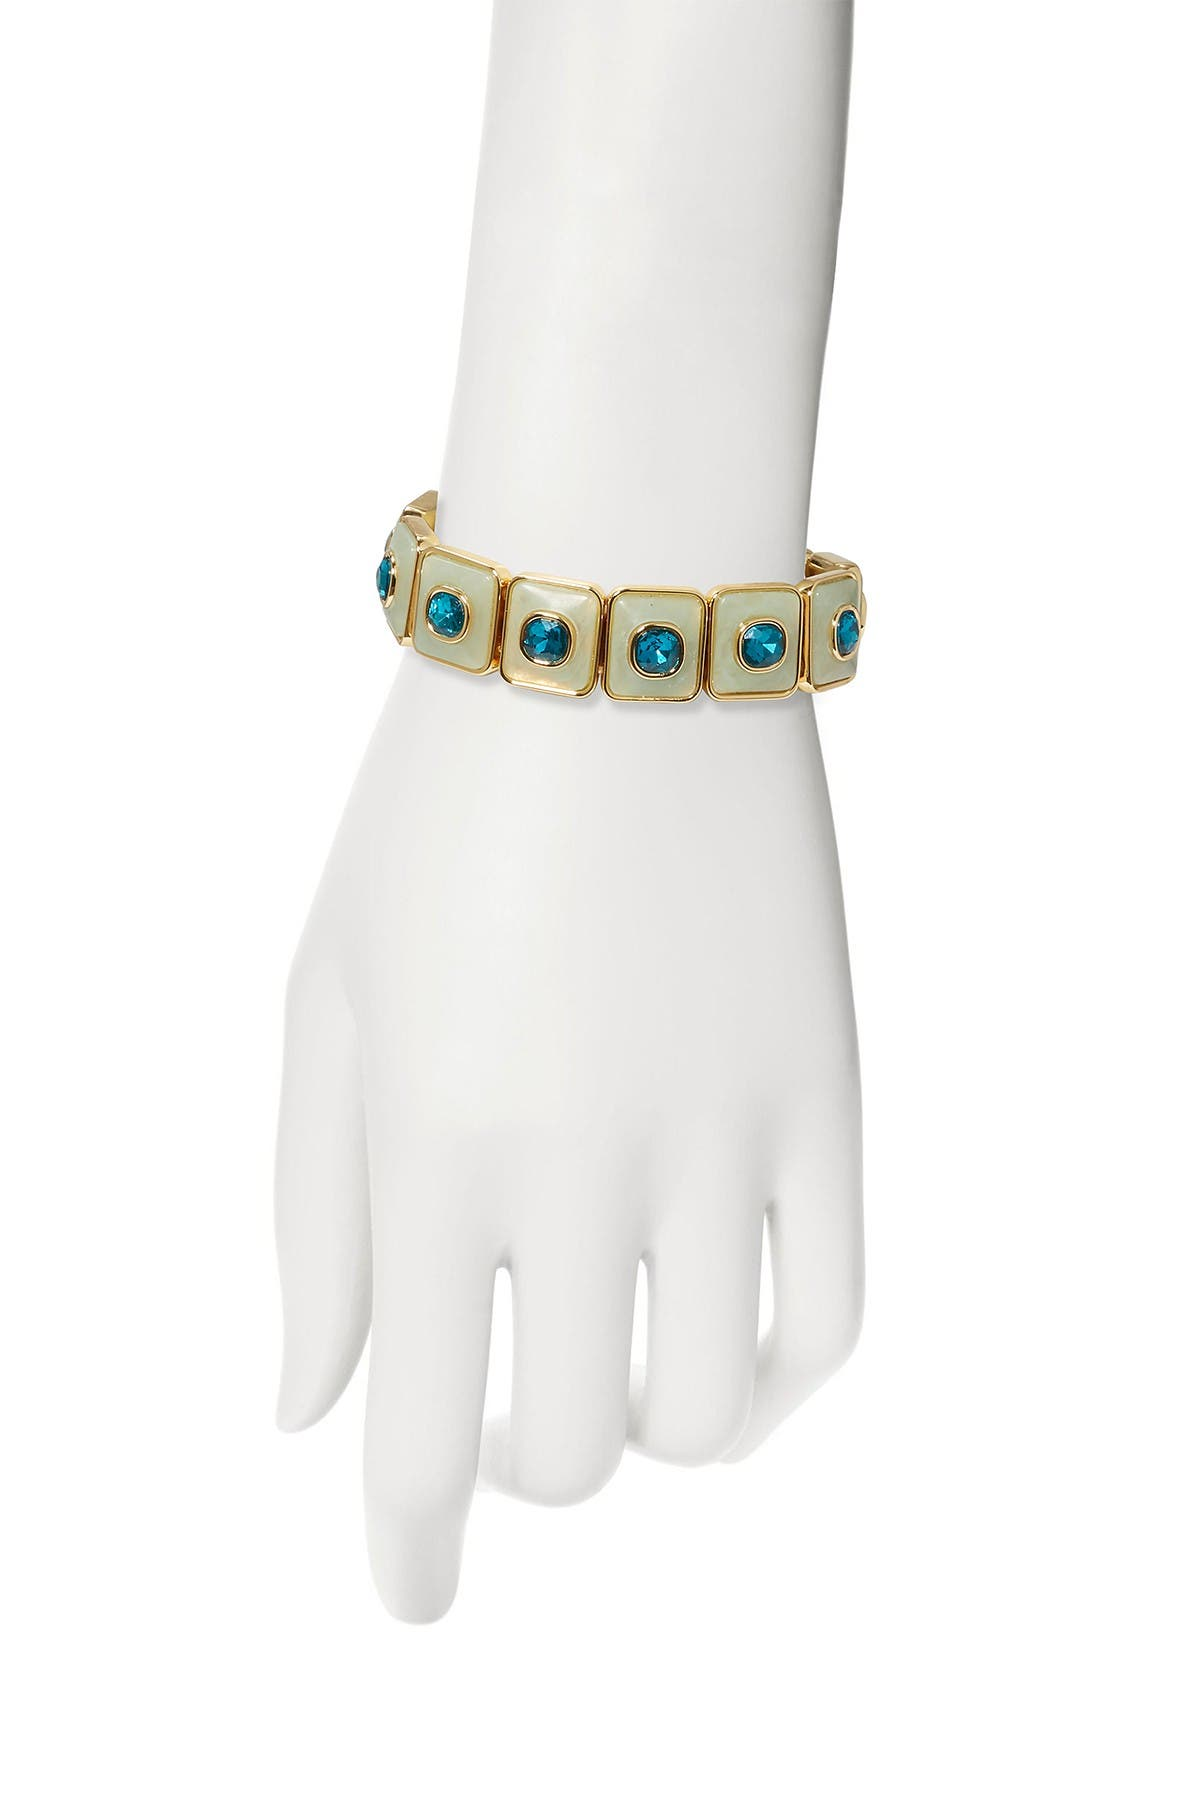 Image of Vince Camuto Crystal Resin Stretch Bracelet